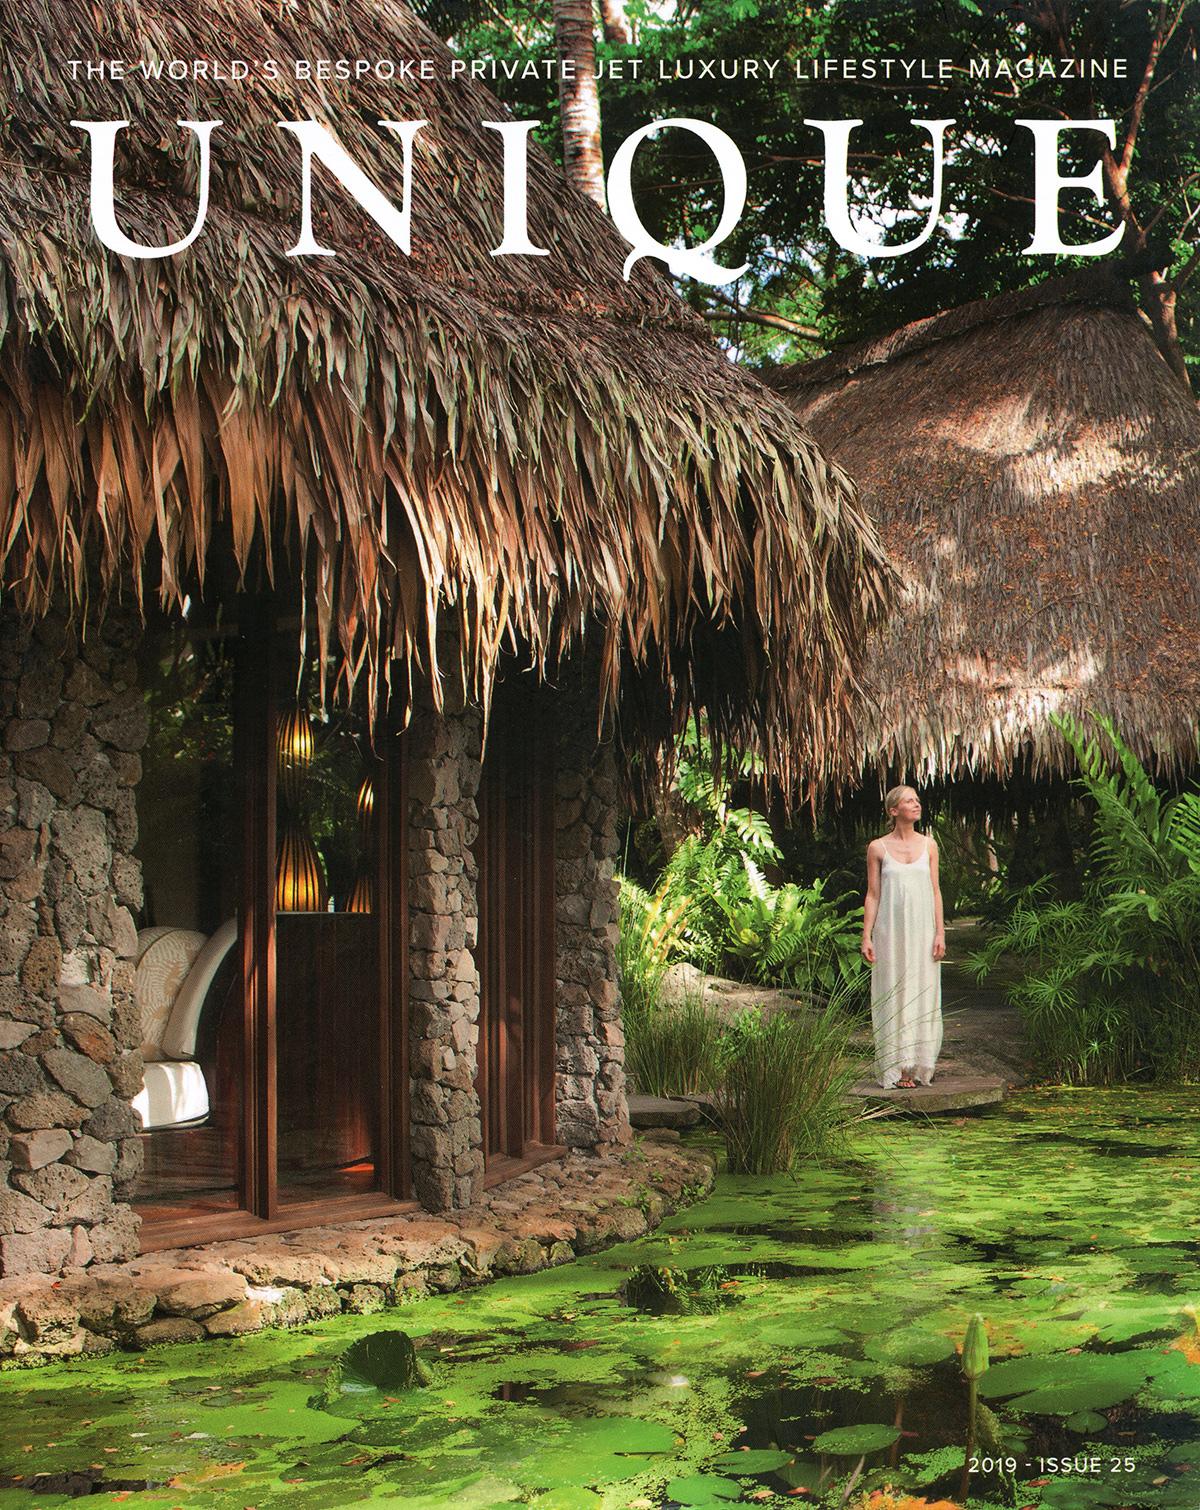 Bespoke Private Jet Luxury Lisfetyle Magazine - UNIQUE